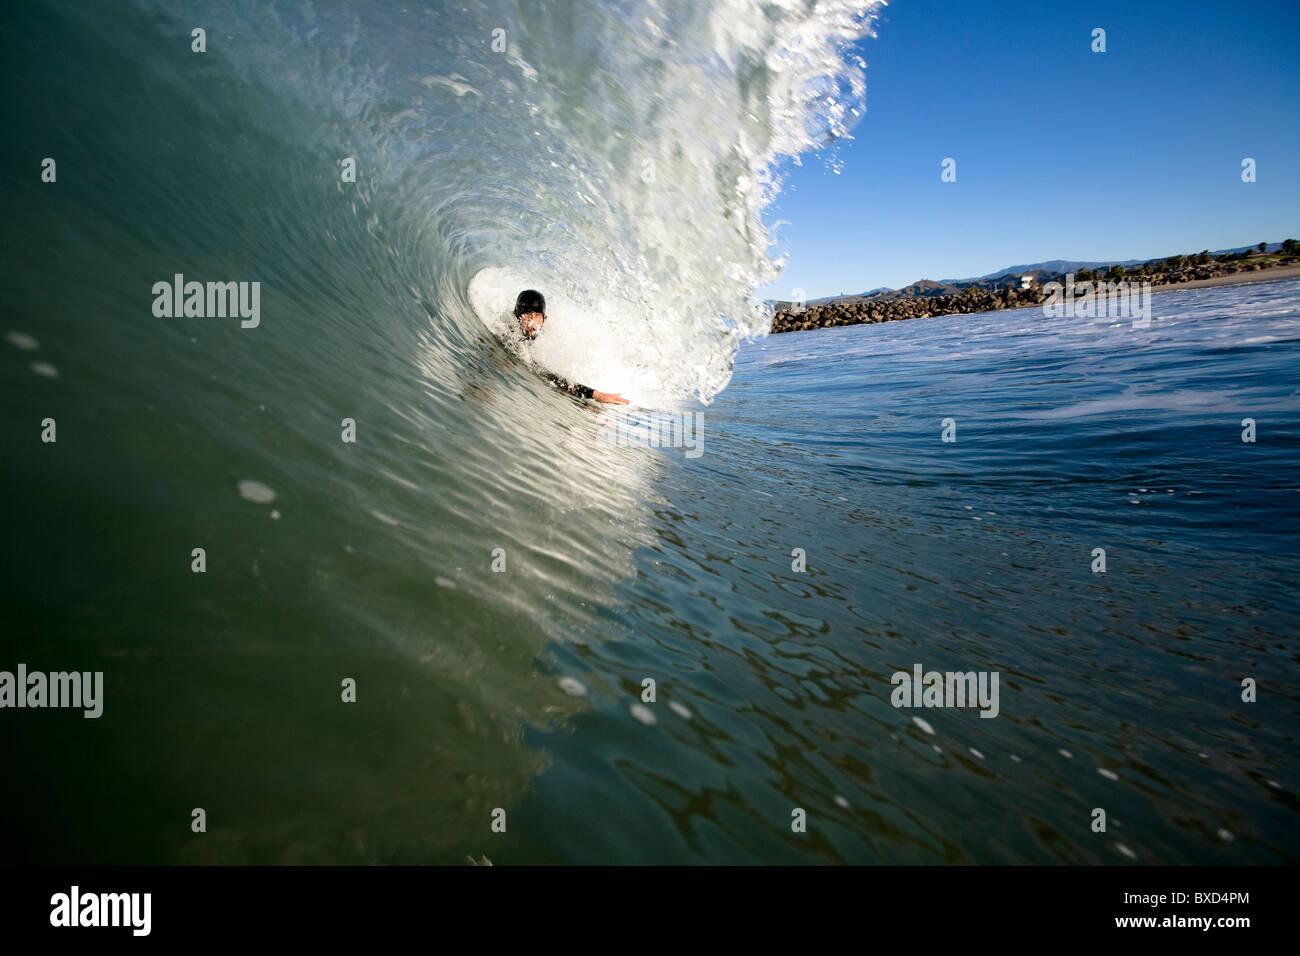 A male bodysurfer gets barrel. - Stock Image